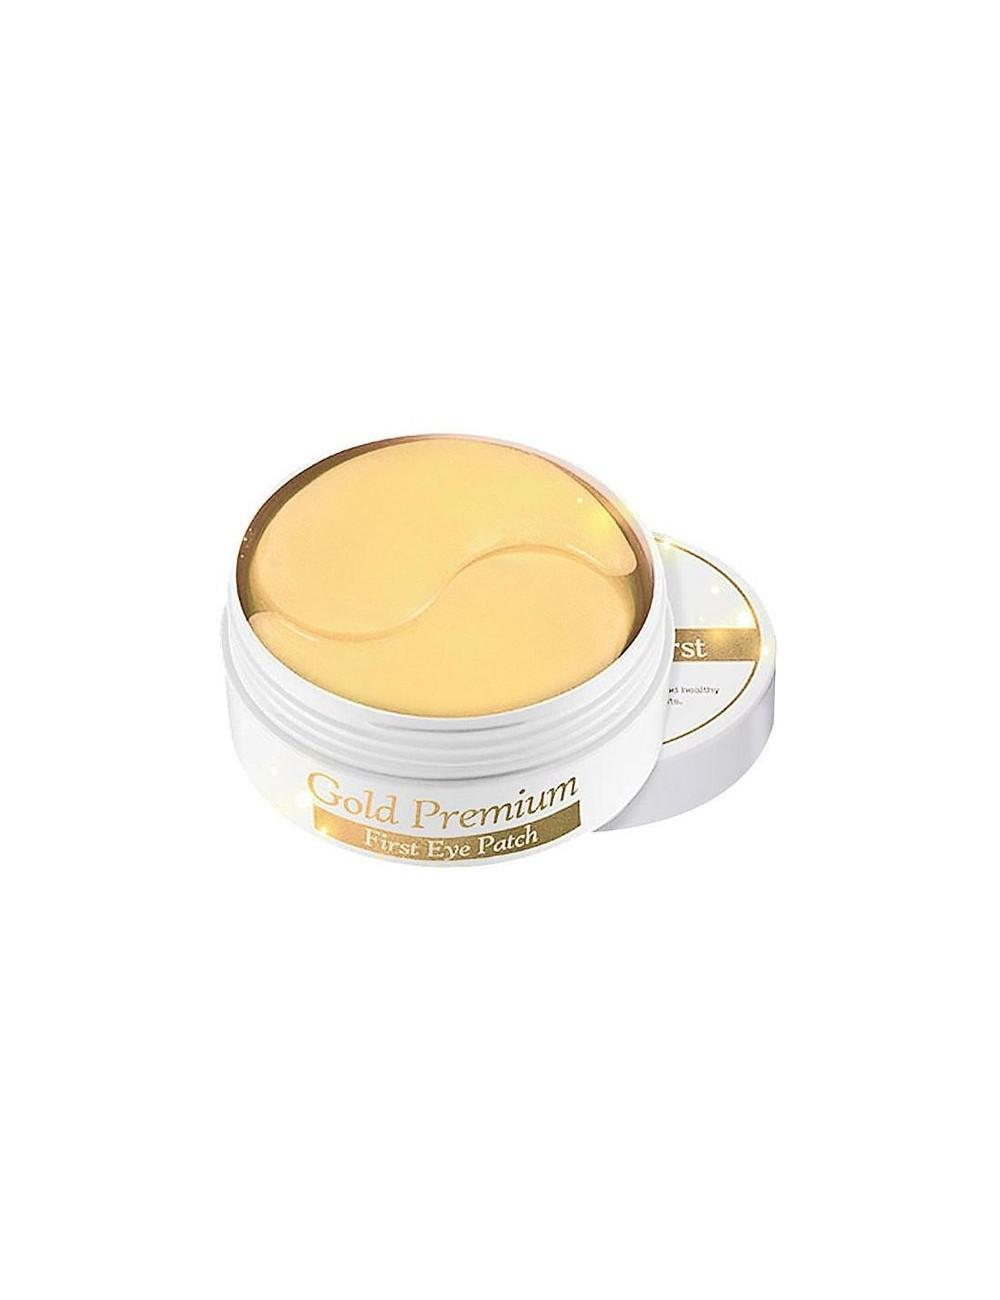 Parches para Contorno de Ojos Secret Key Gold Premium First Eye Patch Patch